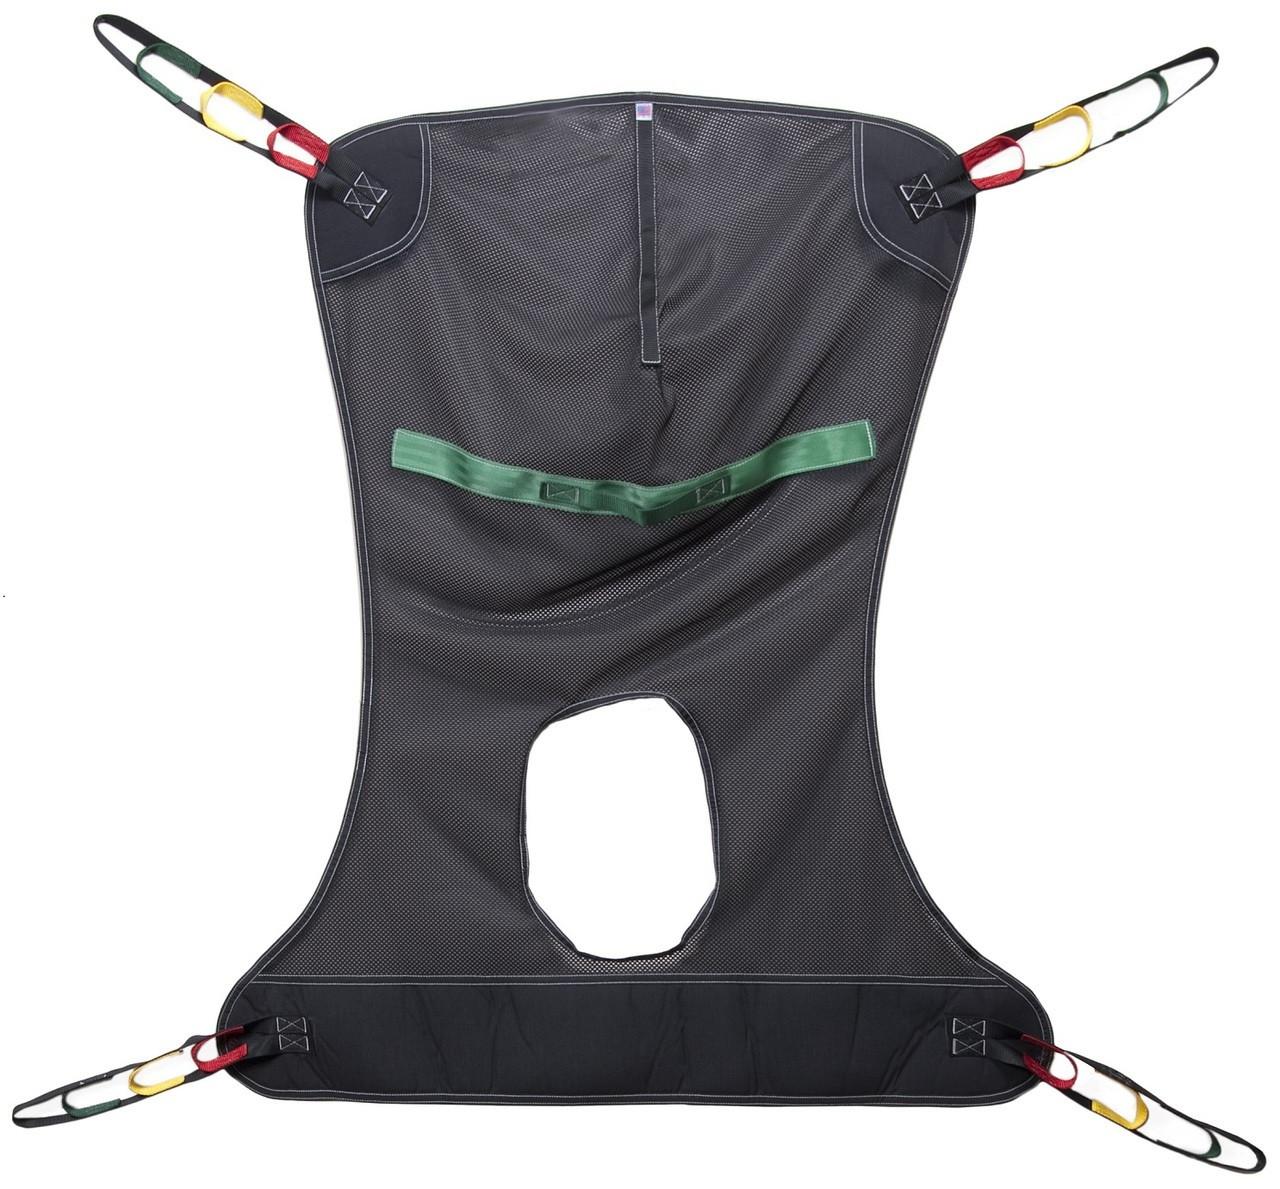 Lumex Full Body Sling - Mesh Commode - Medium - FMC114